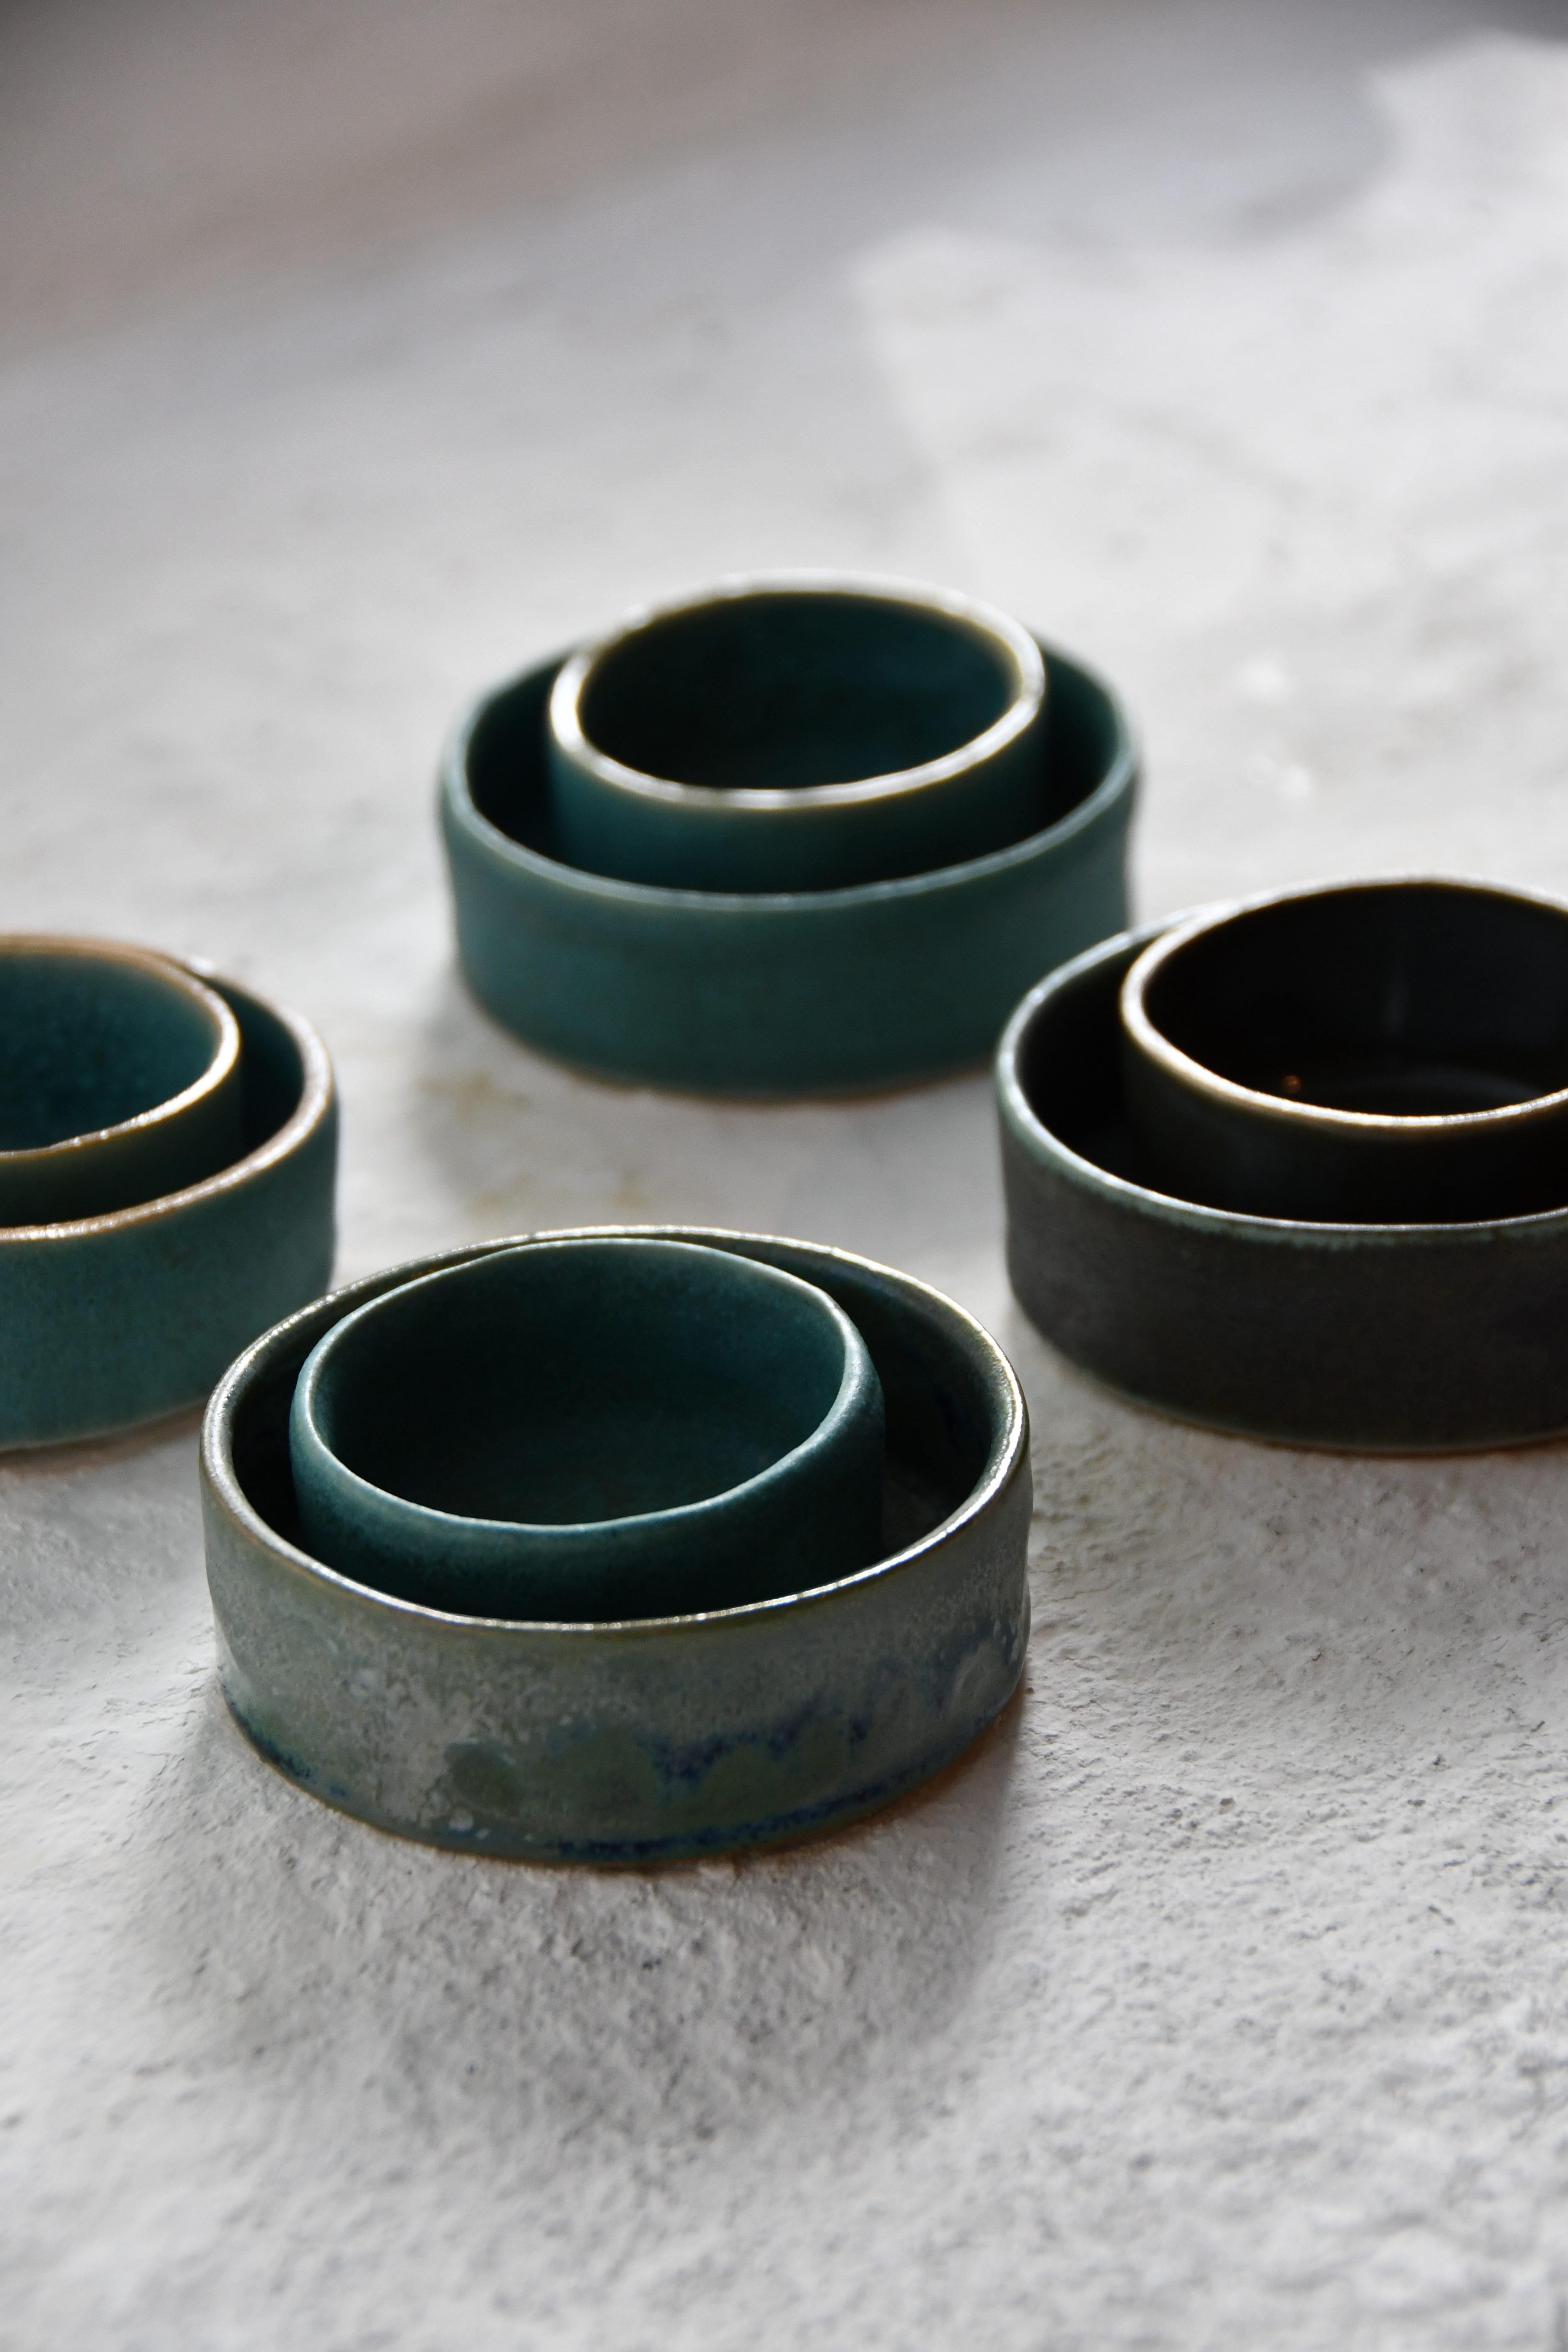 signes ceramics, ferm print, plantetrykk, botanisk trykk, drivved, redesign, ferns, bregner, keramikkurs,signe schineller keramikk, resignert, ceramic pattern, halsnøy kloster, visit Sunnhordland,